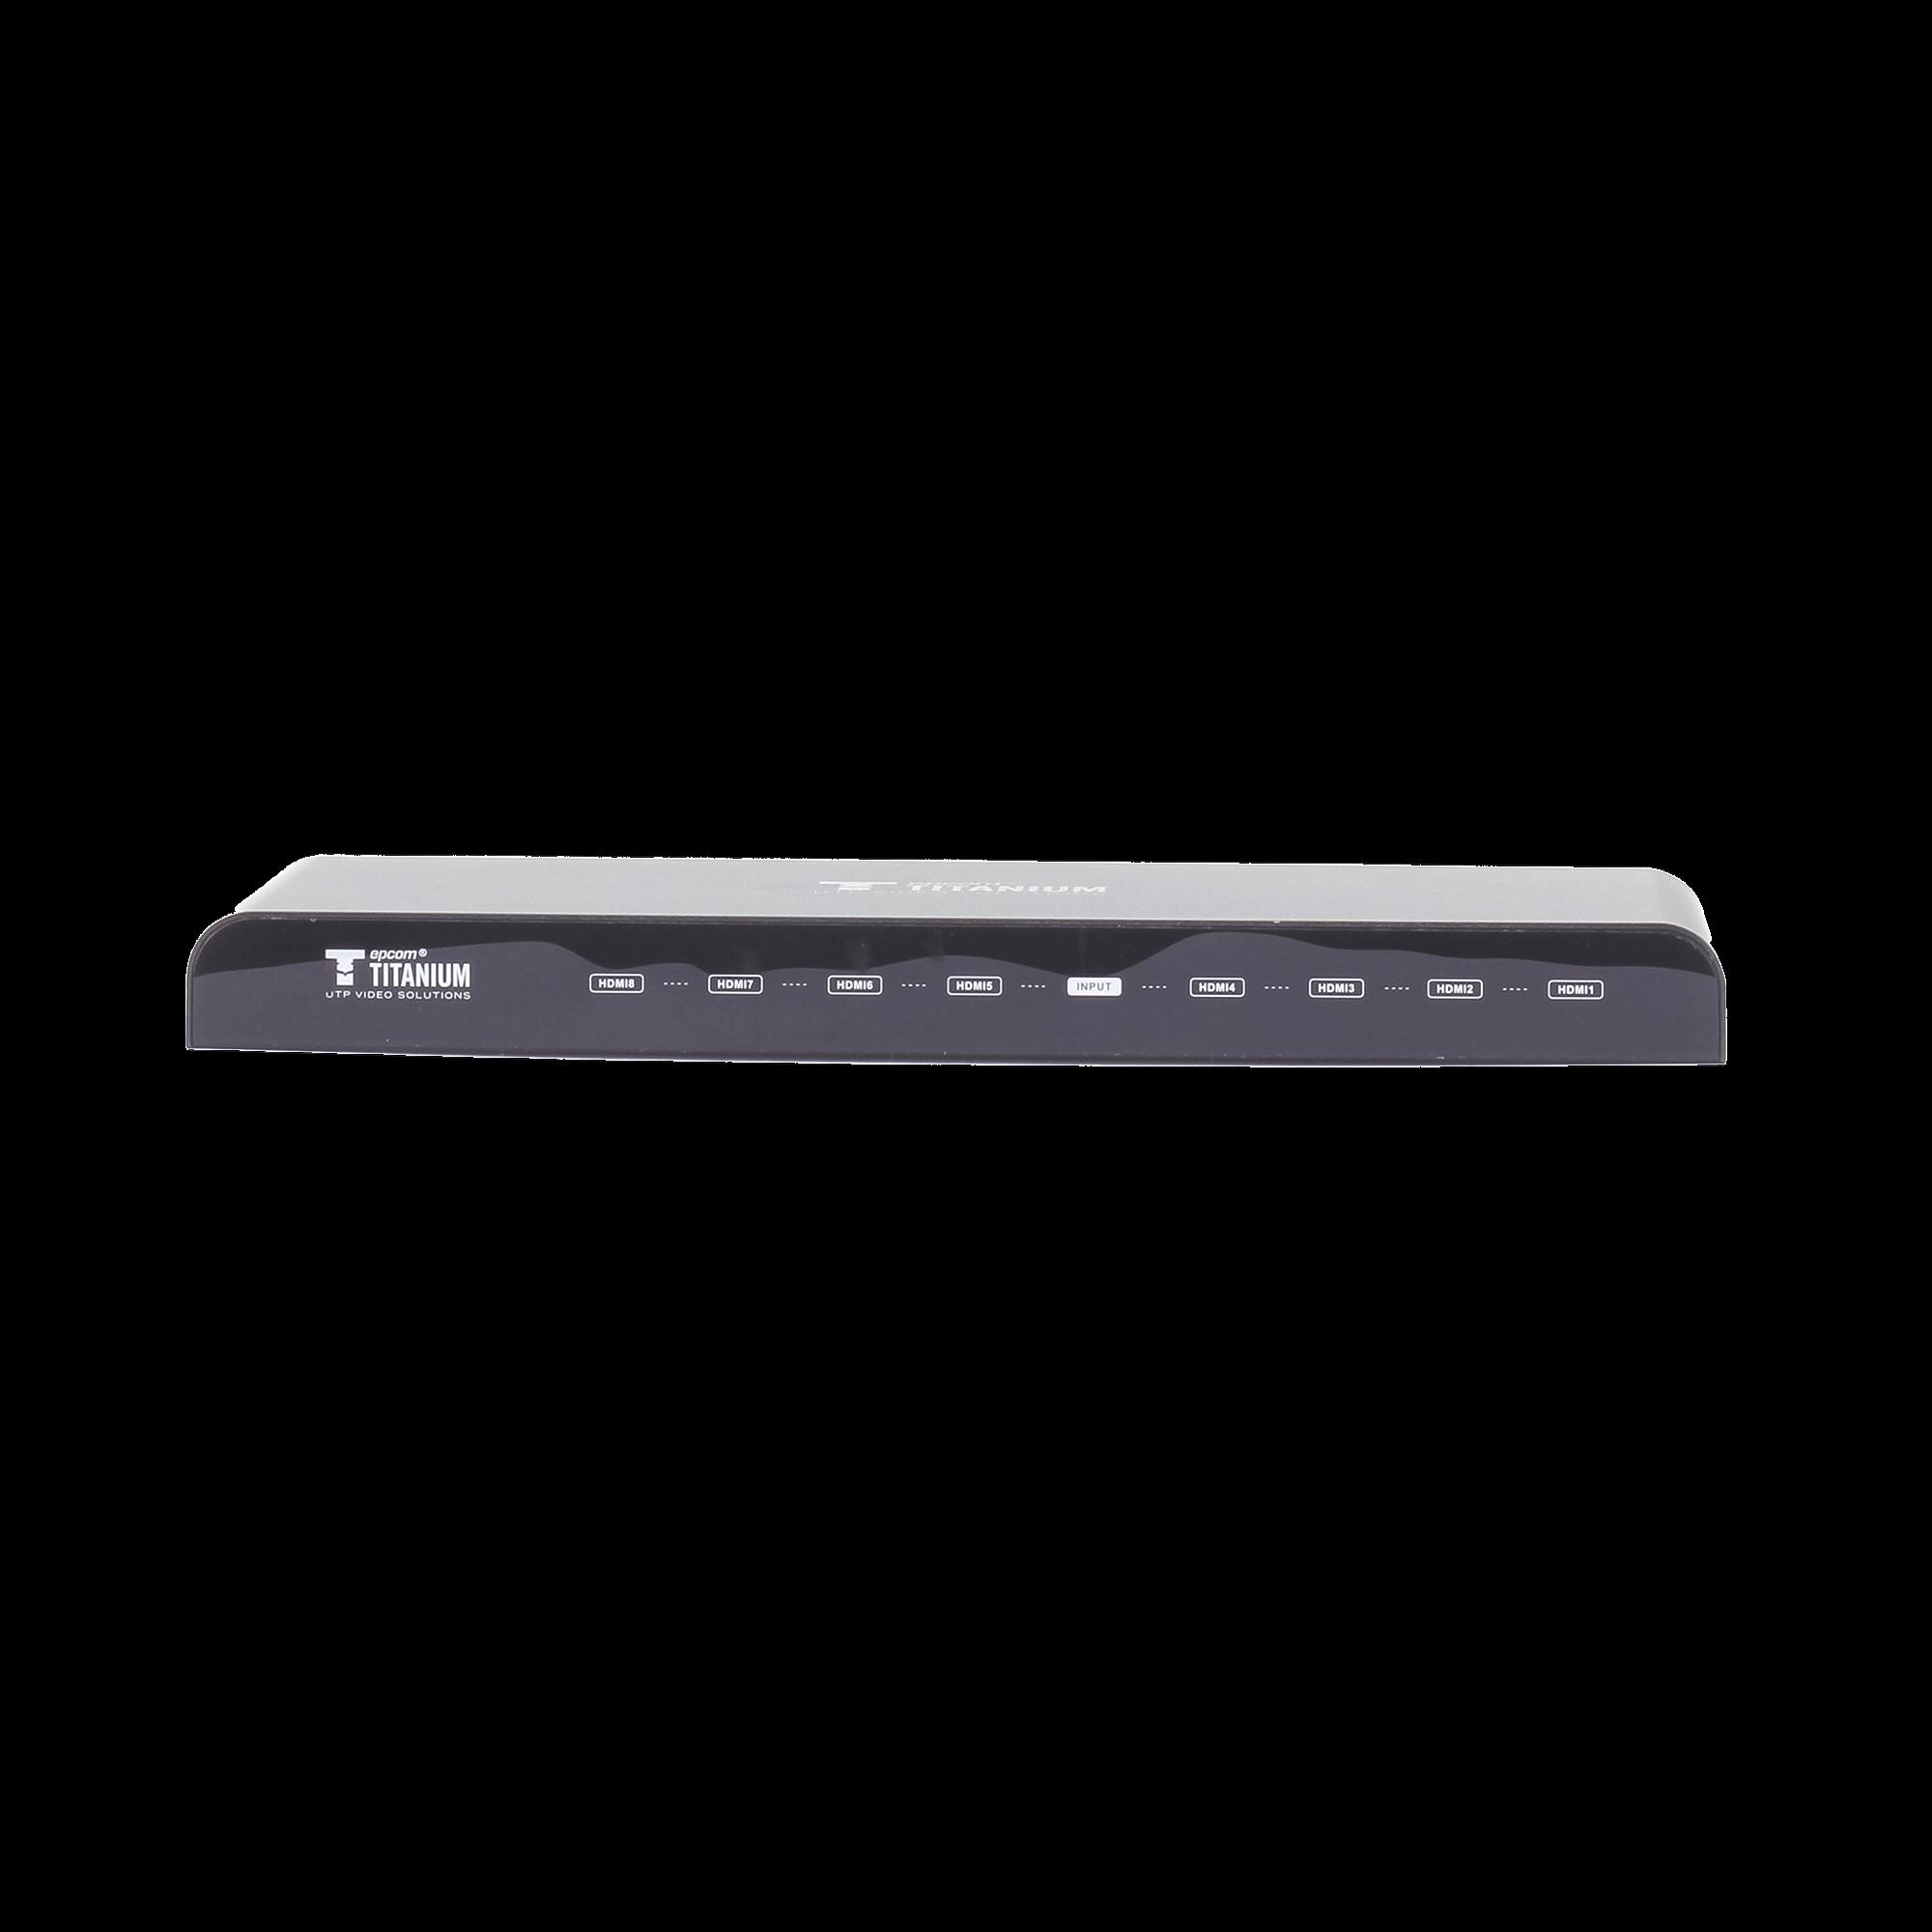 Divisor HDMI de 1 entrada a 8 salidas 4K x 2K @ 30 Hz soporta 3D